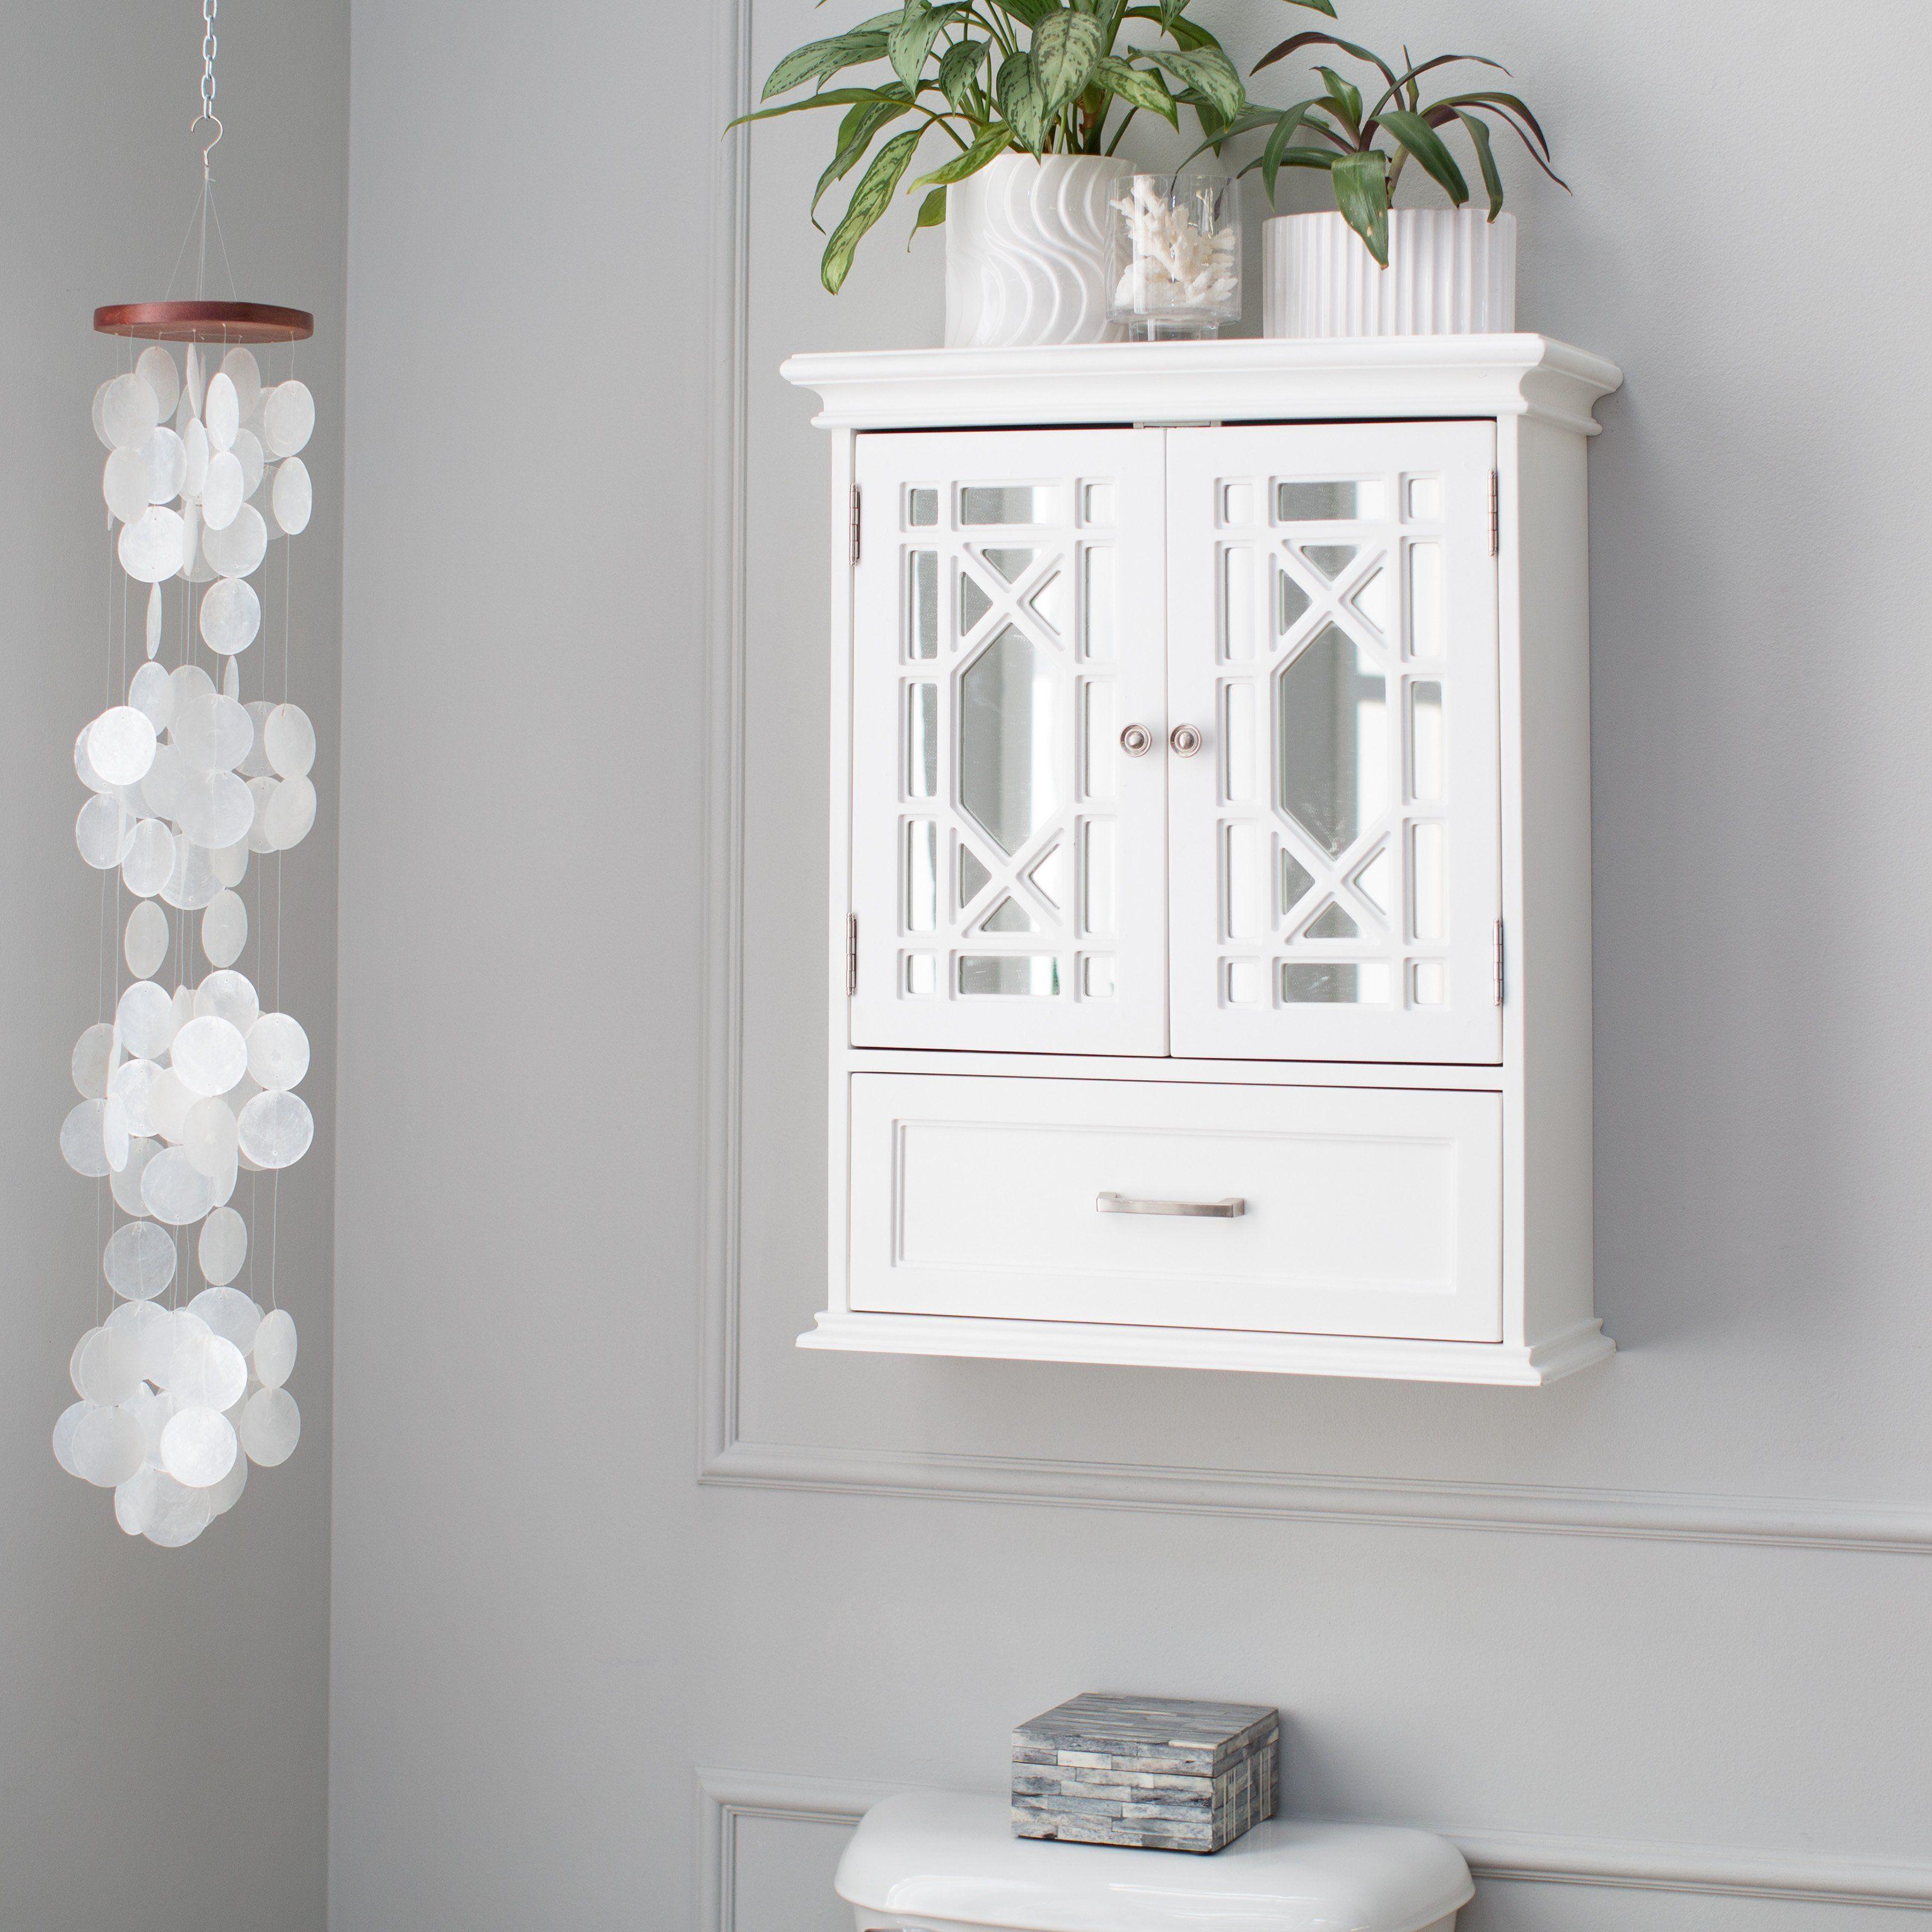 Belham Living Florence Bathroom Wall Cabinet Bathroom Wall Cabinets Wall Cabinet Decor